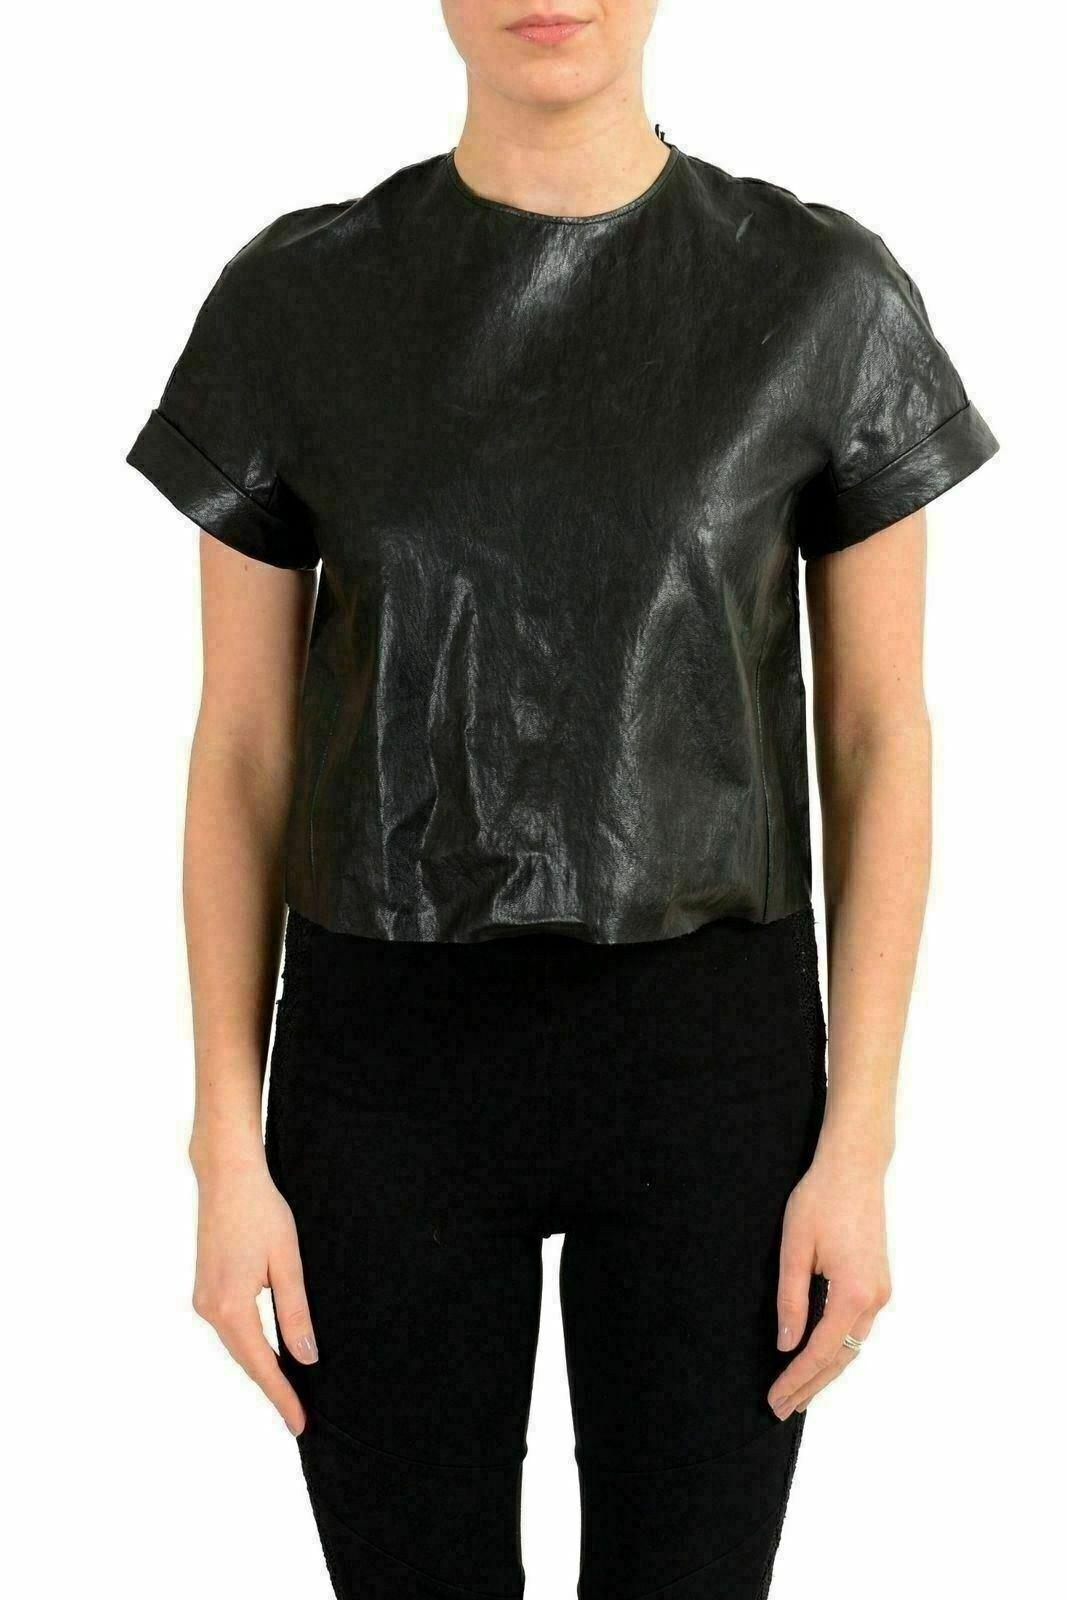 Just Cavalli Woherren Faux Leather schwarz Cropped Top US S IT 40